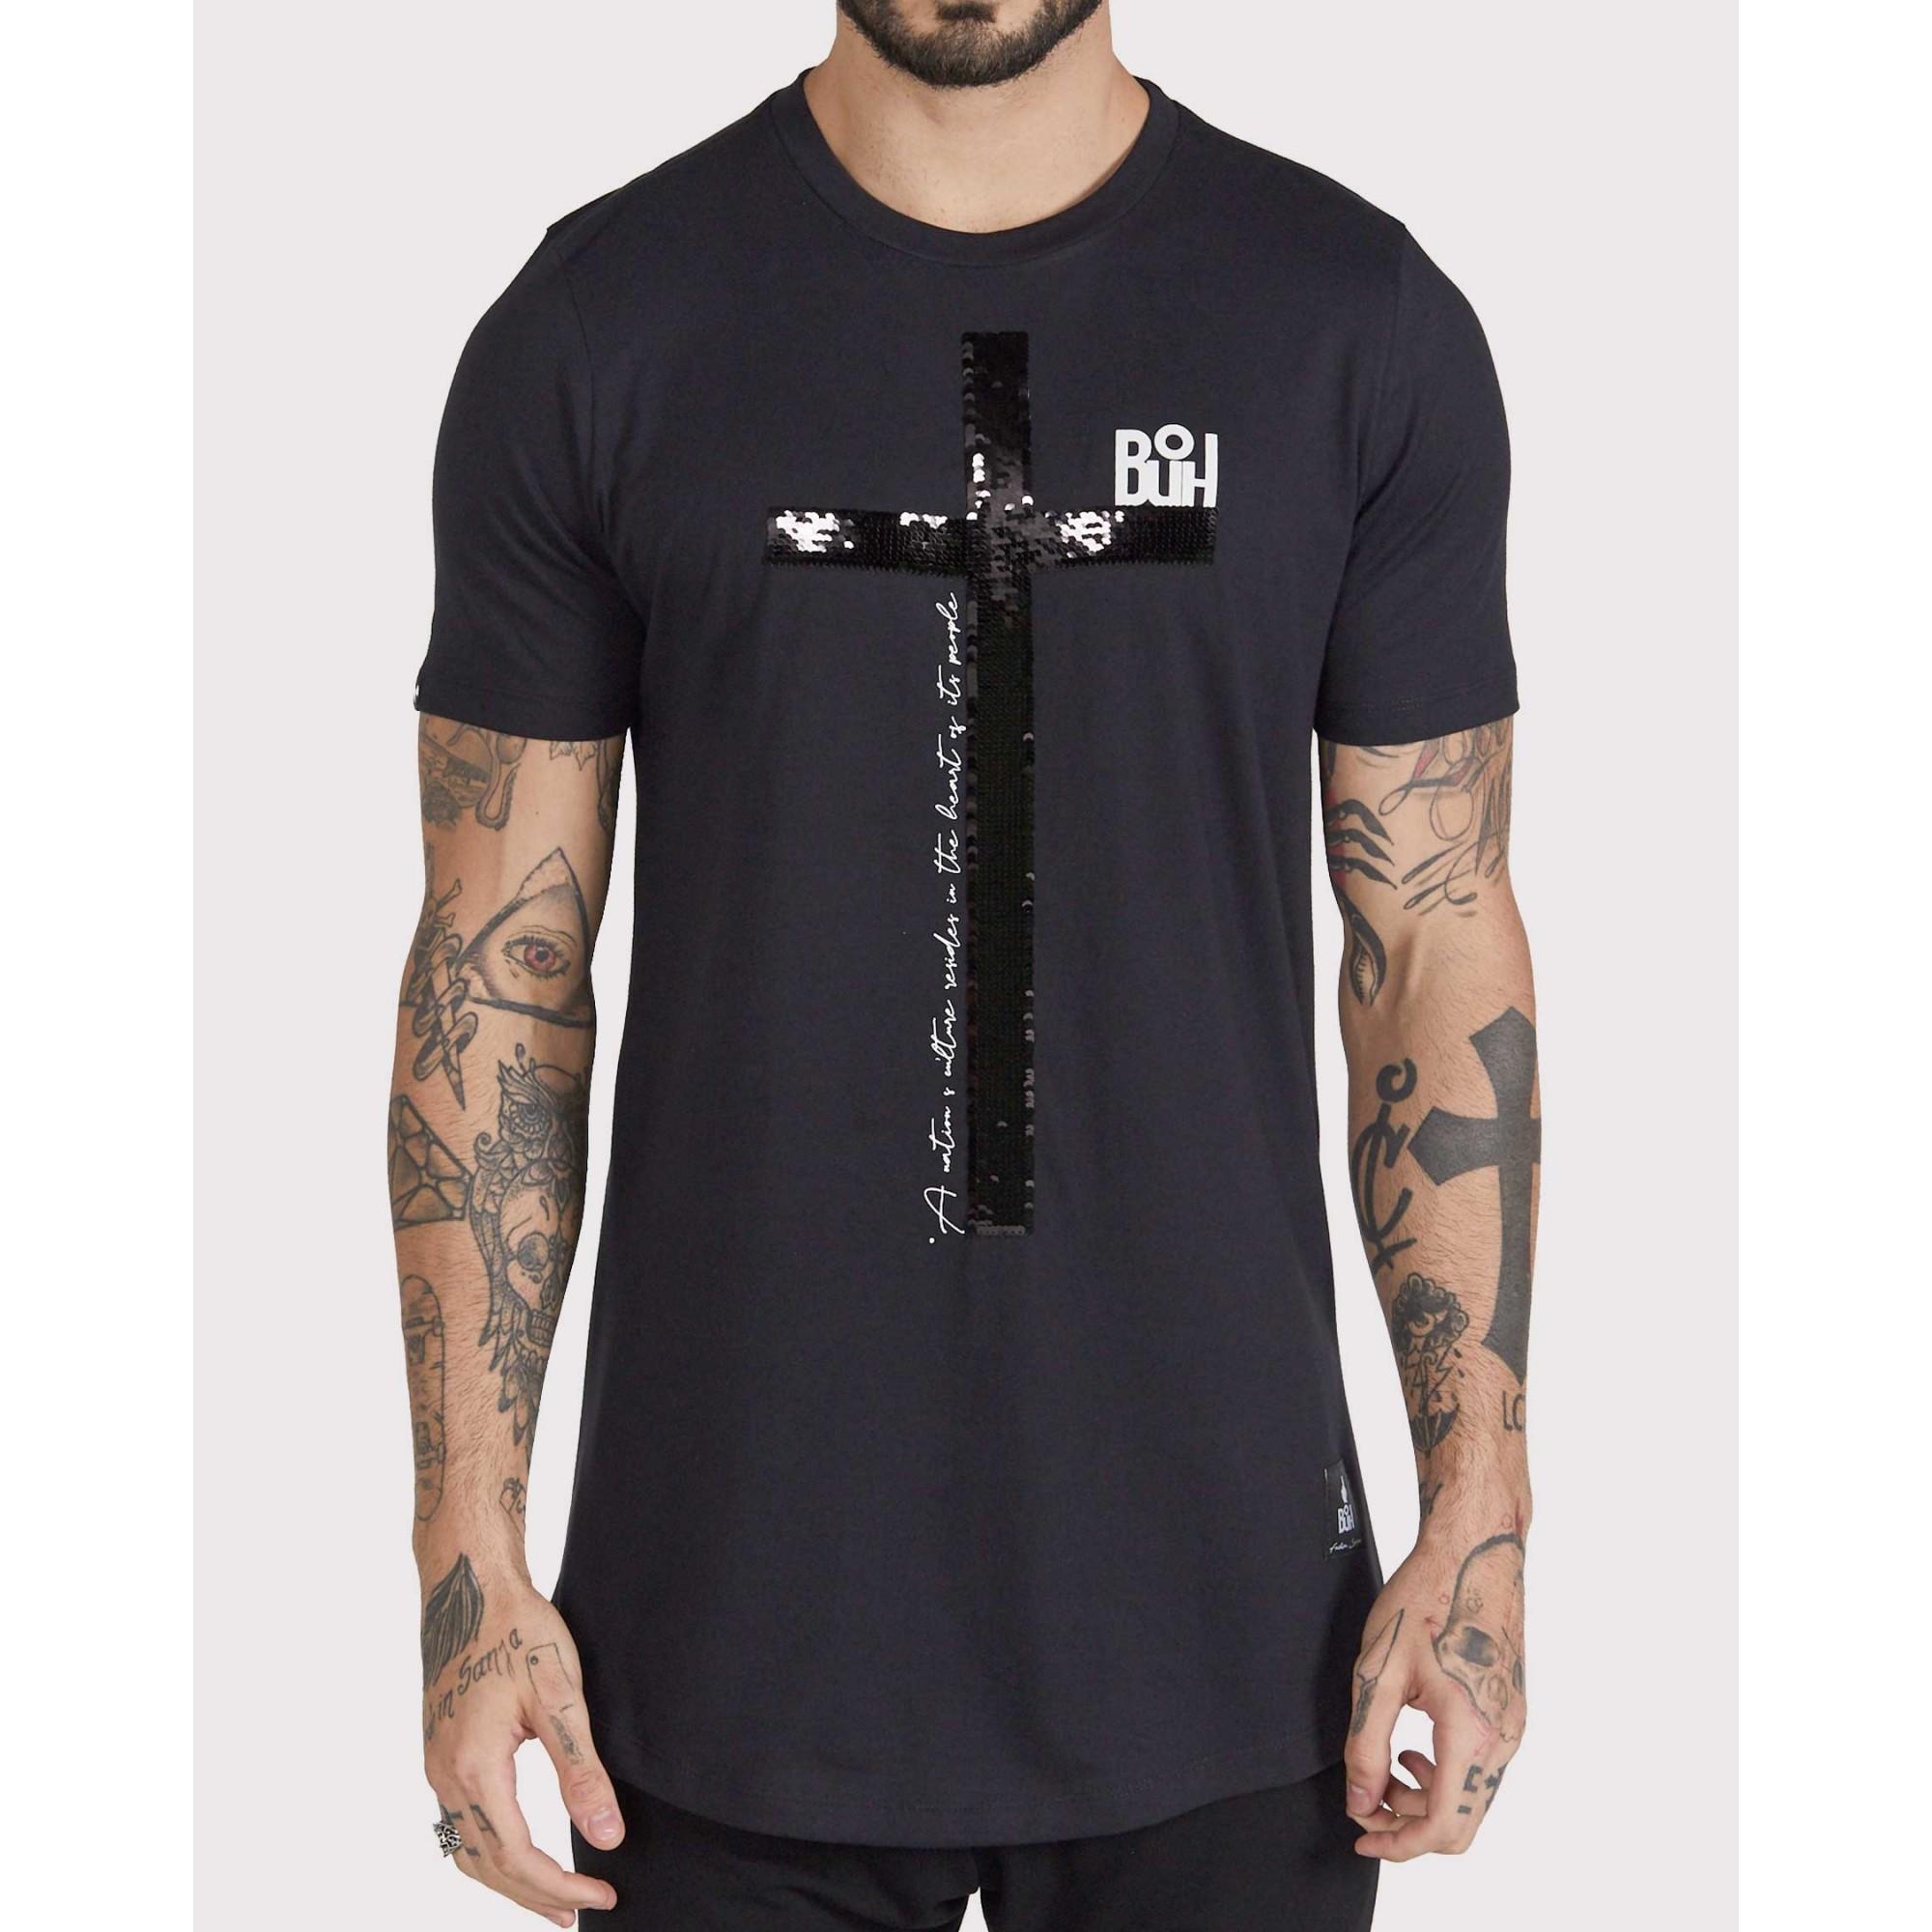 Camiseta Buh Paetê Cruz Black